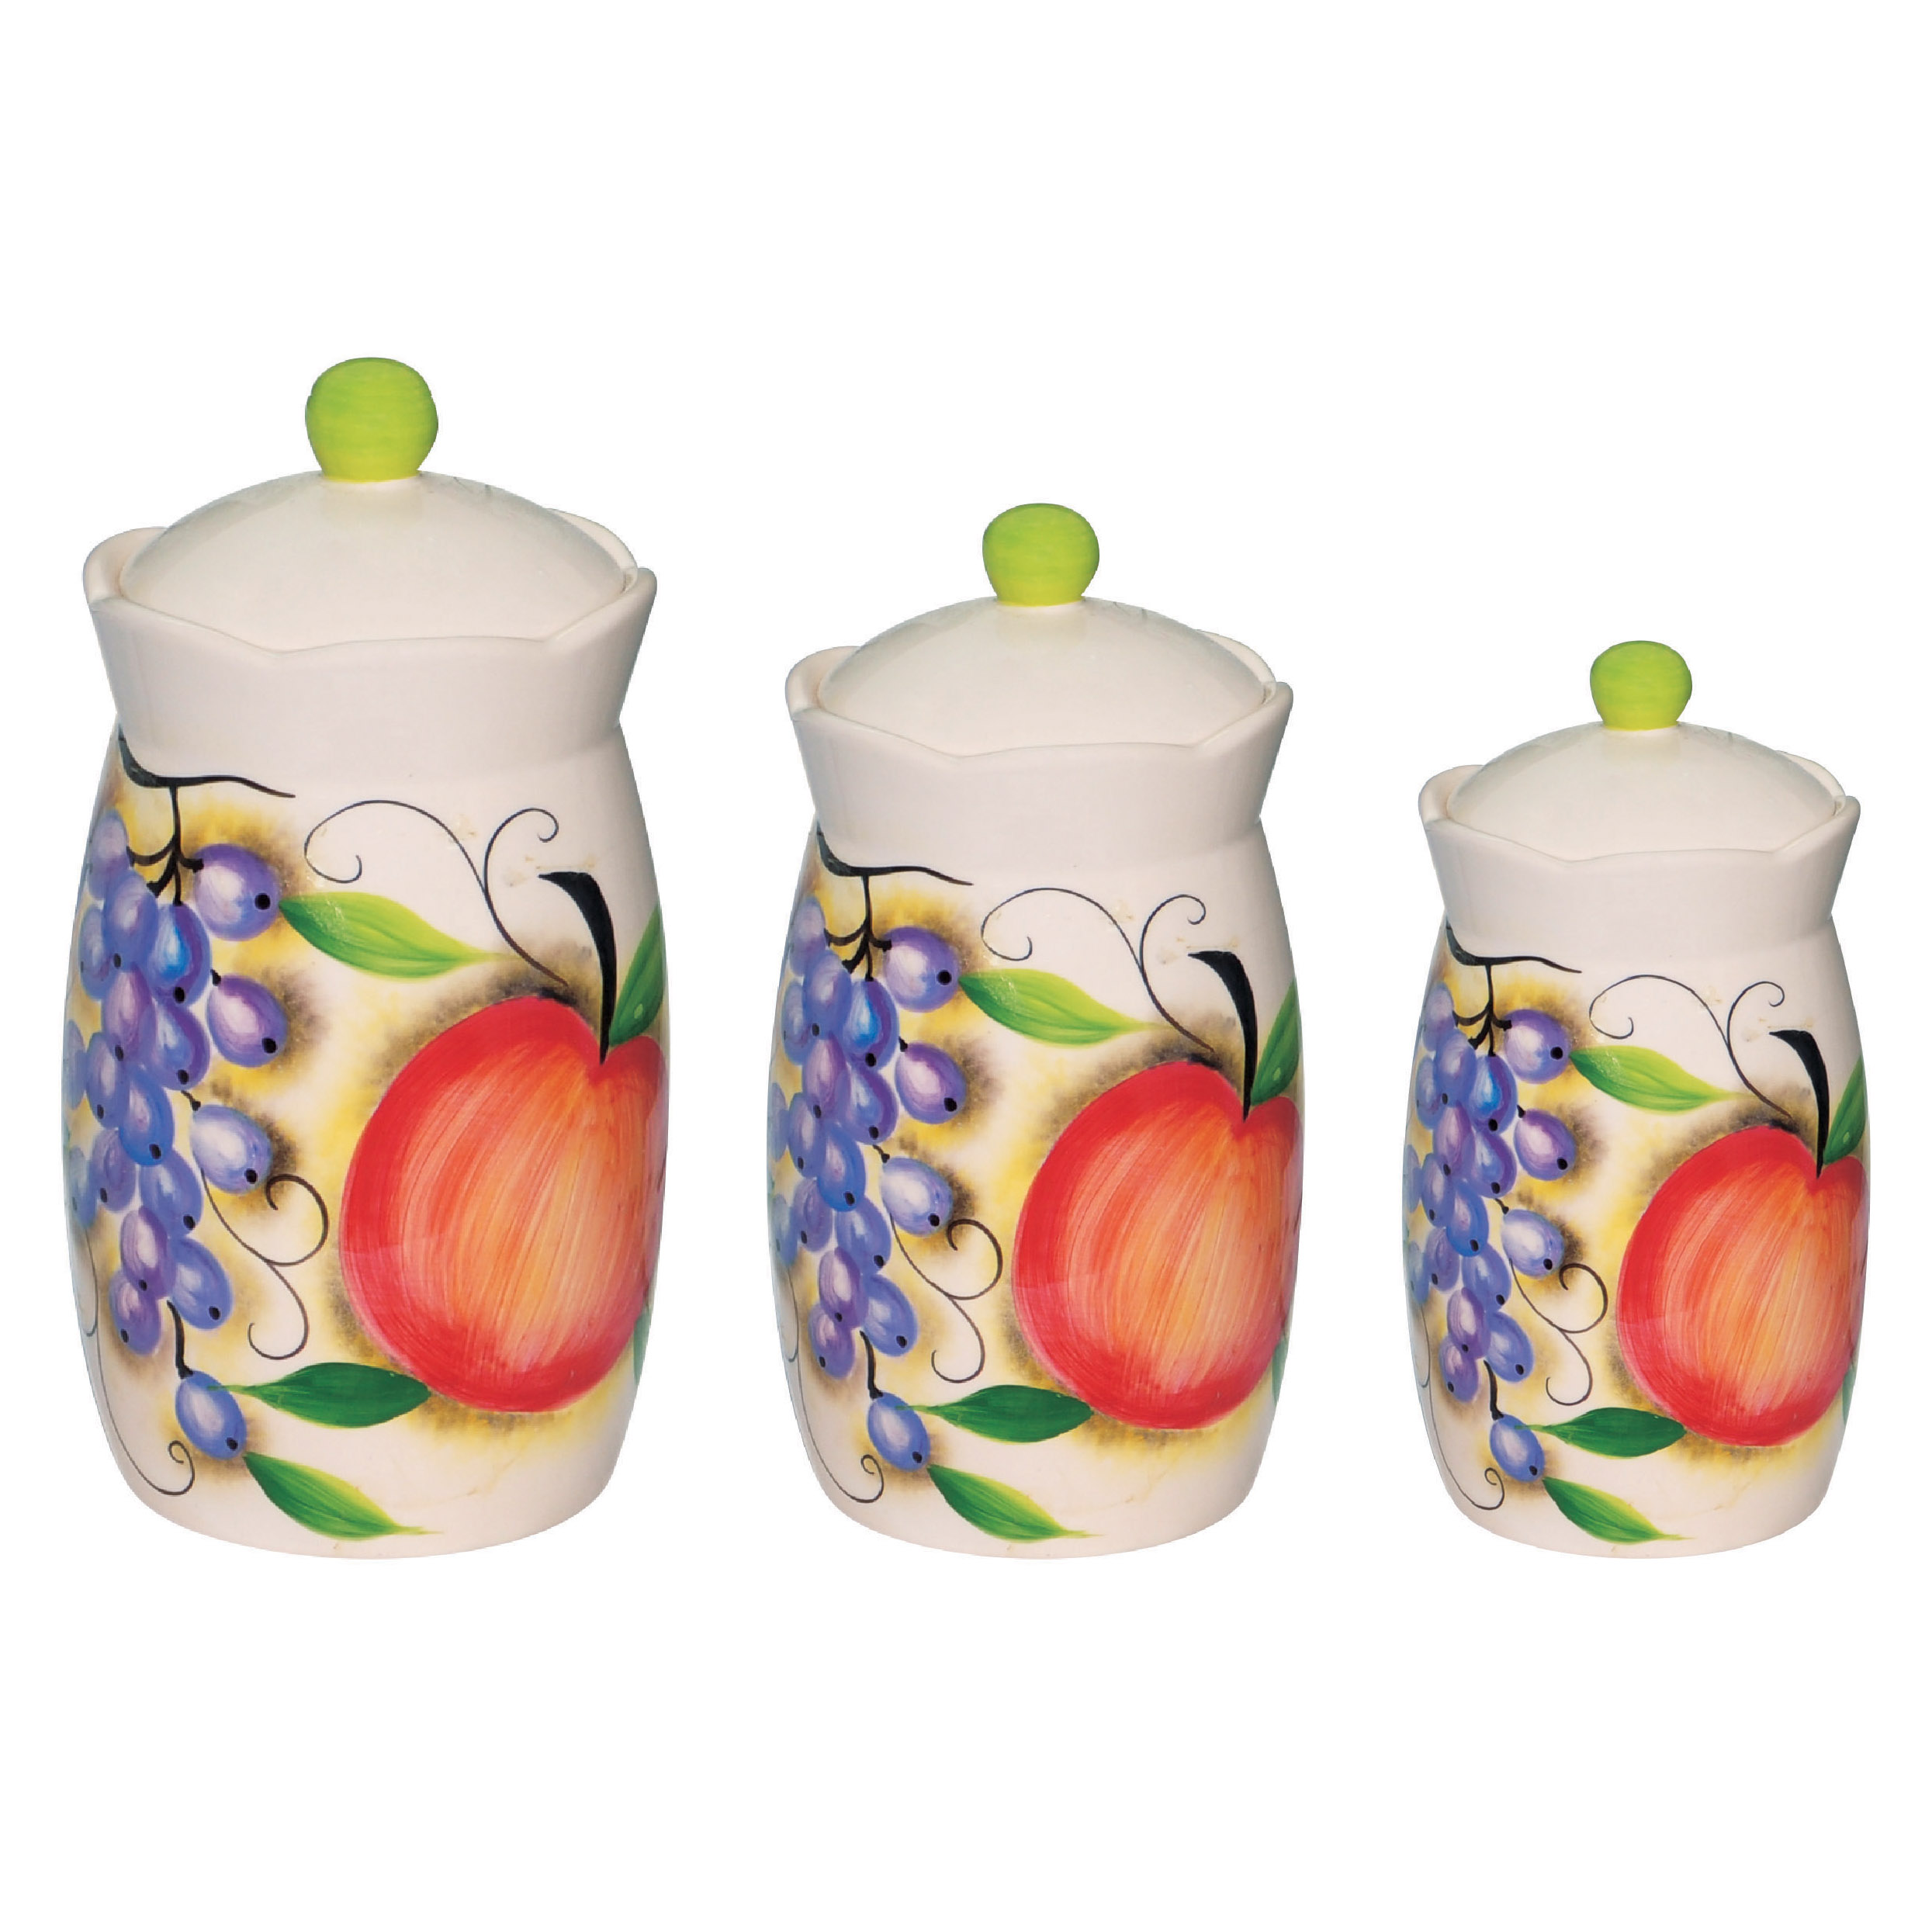 fruit design 3 piece canister set